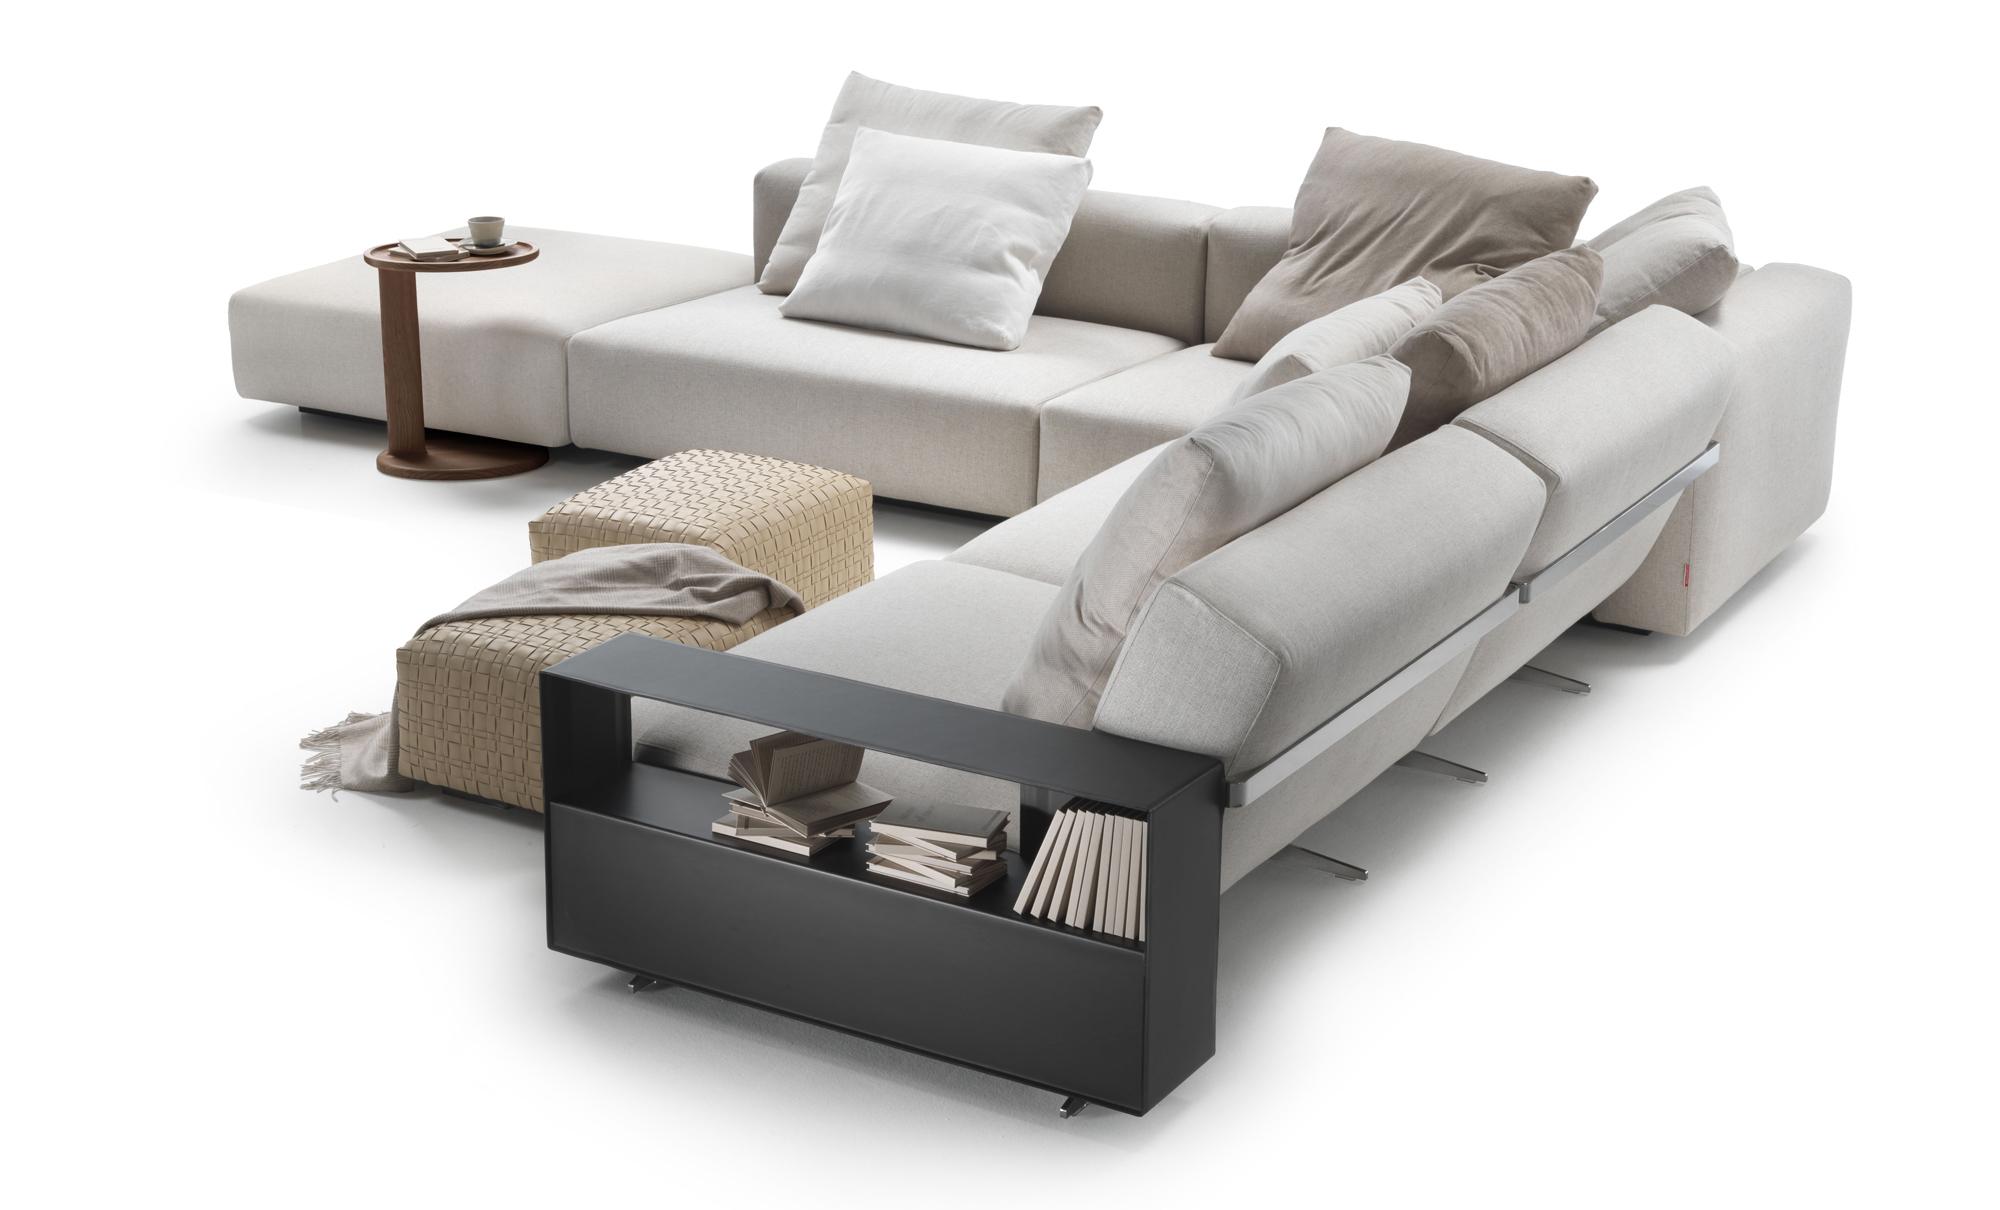 Lario modular sofa fanuli furniture for Divani flexform outlet